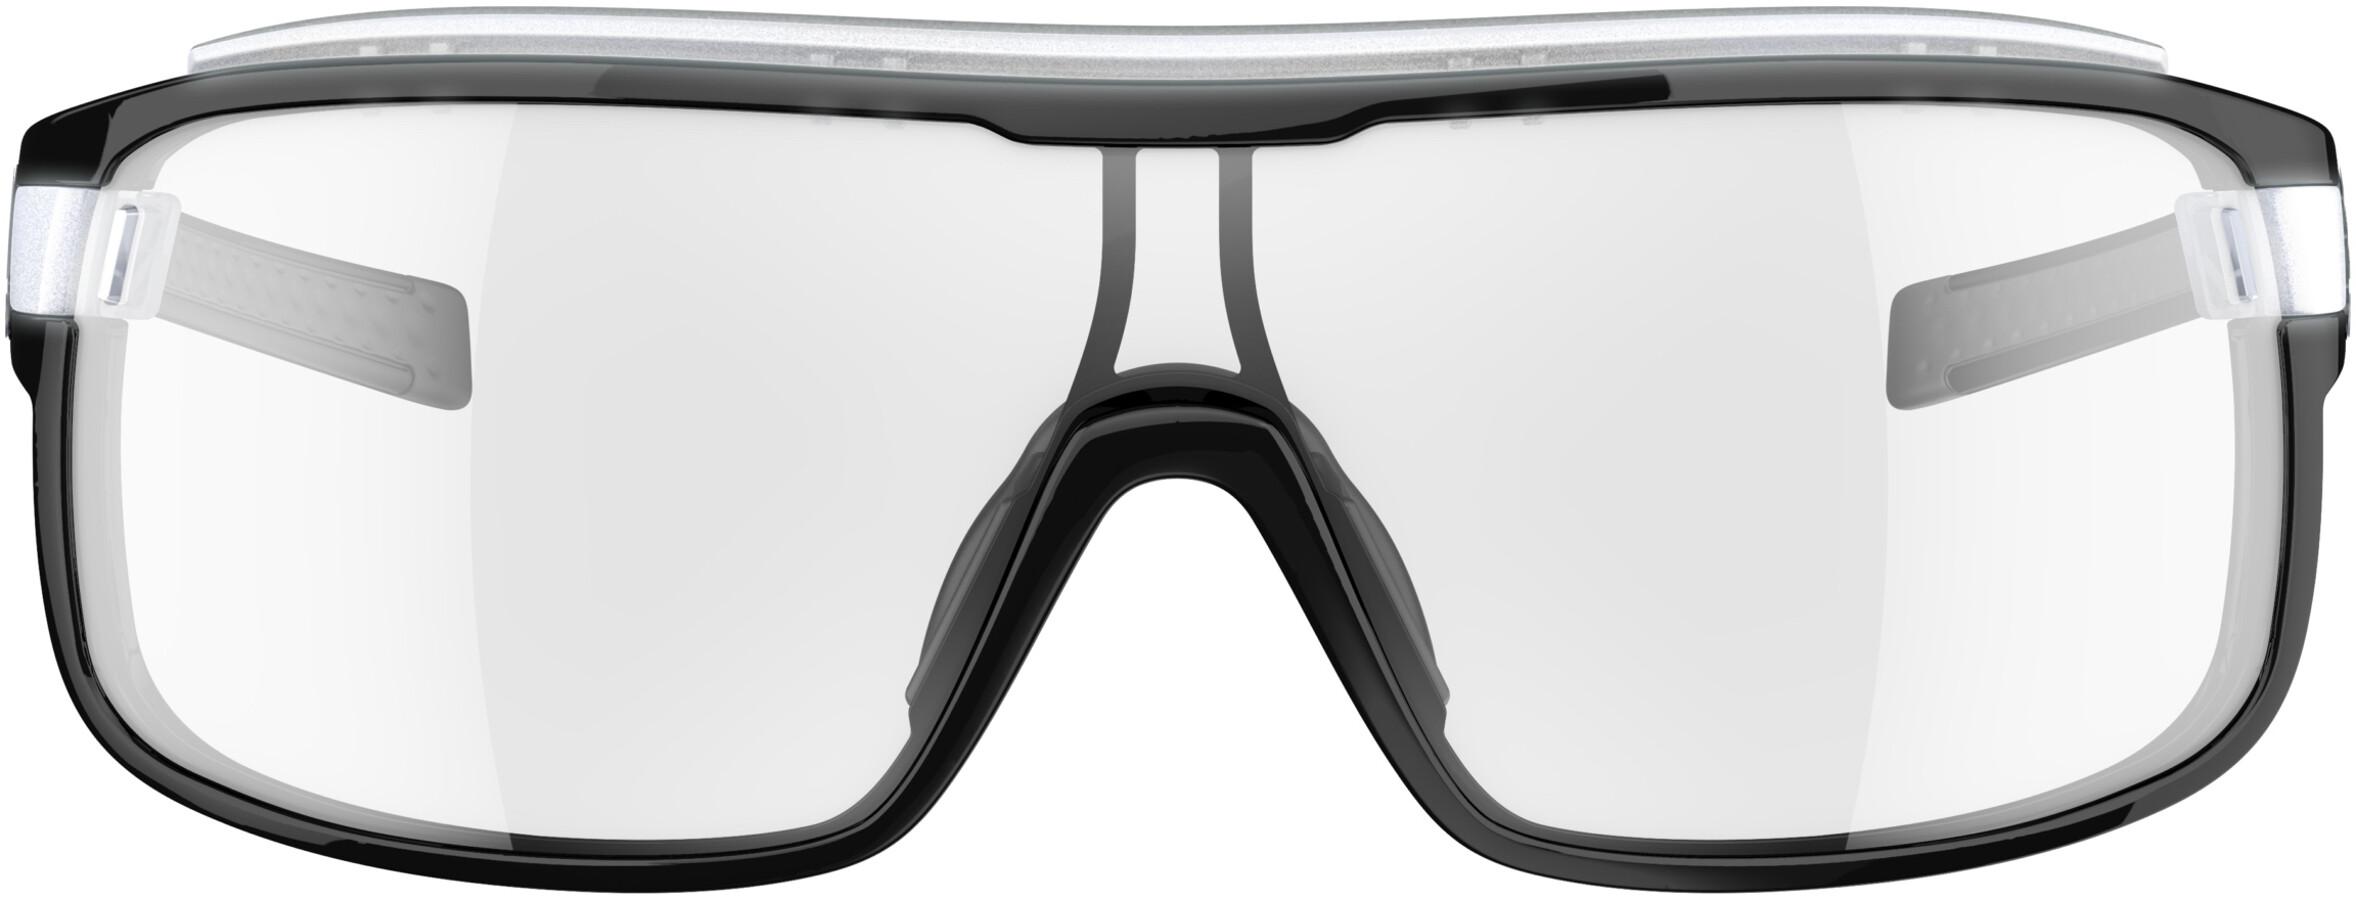 aa4090c53ce0 adidas Zonyk Pro L Bike Glasses black at Addnature.co.uk